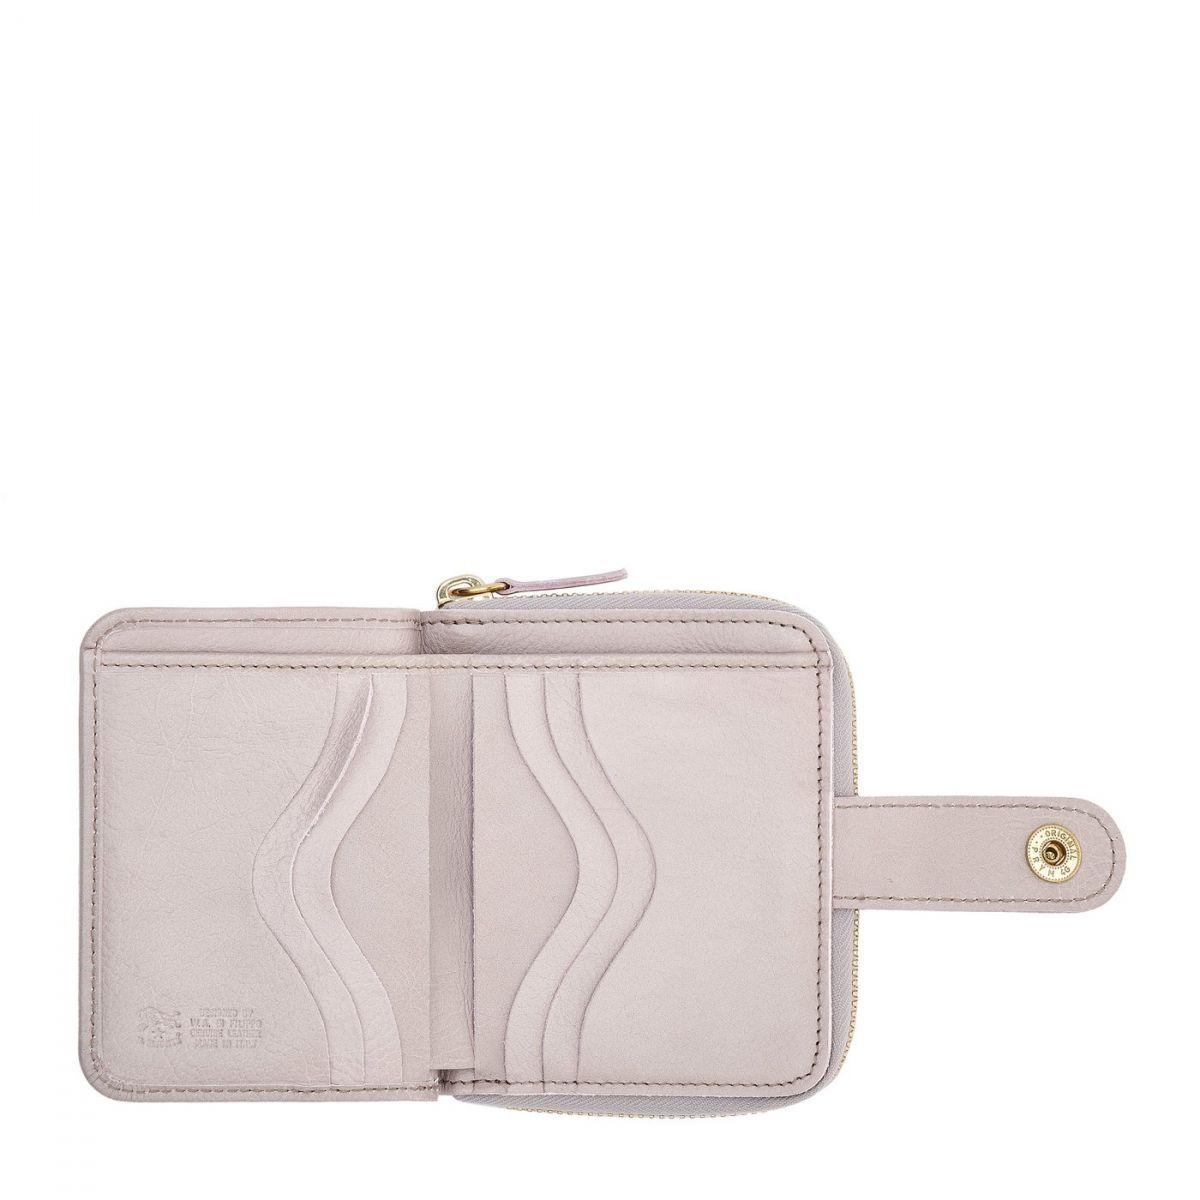 Women's Wallet in Cowhide Leather color Mauve - SMW067 | Details